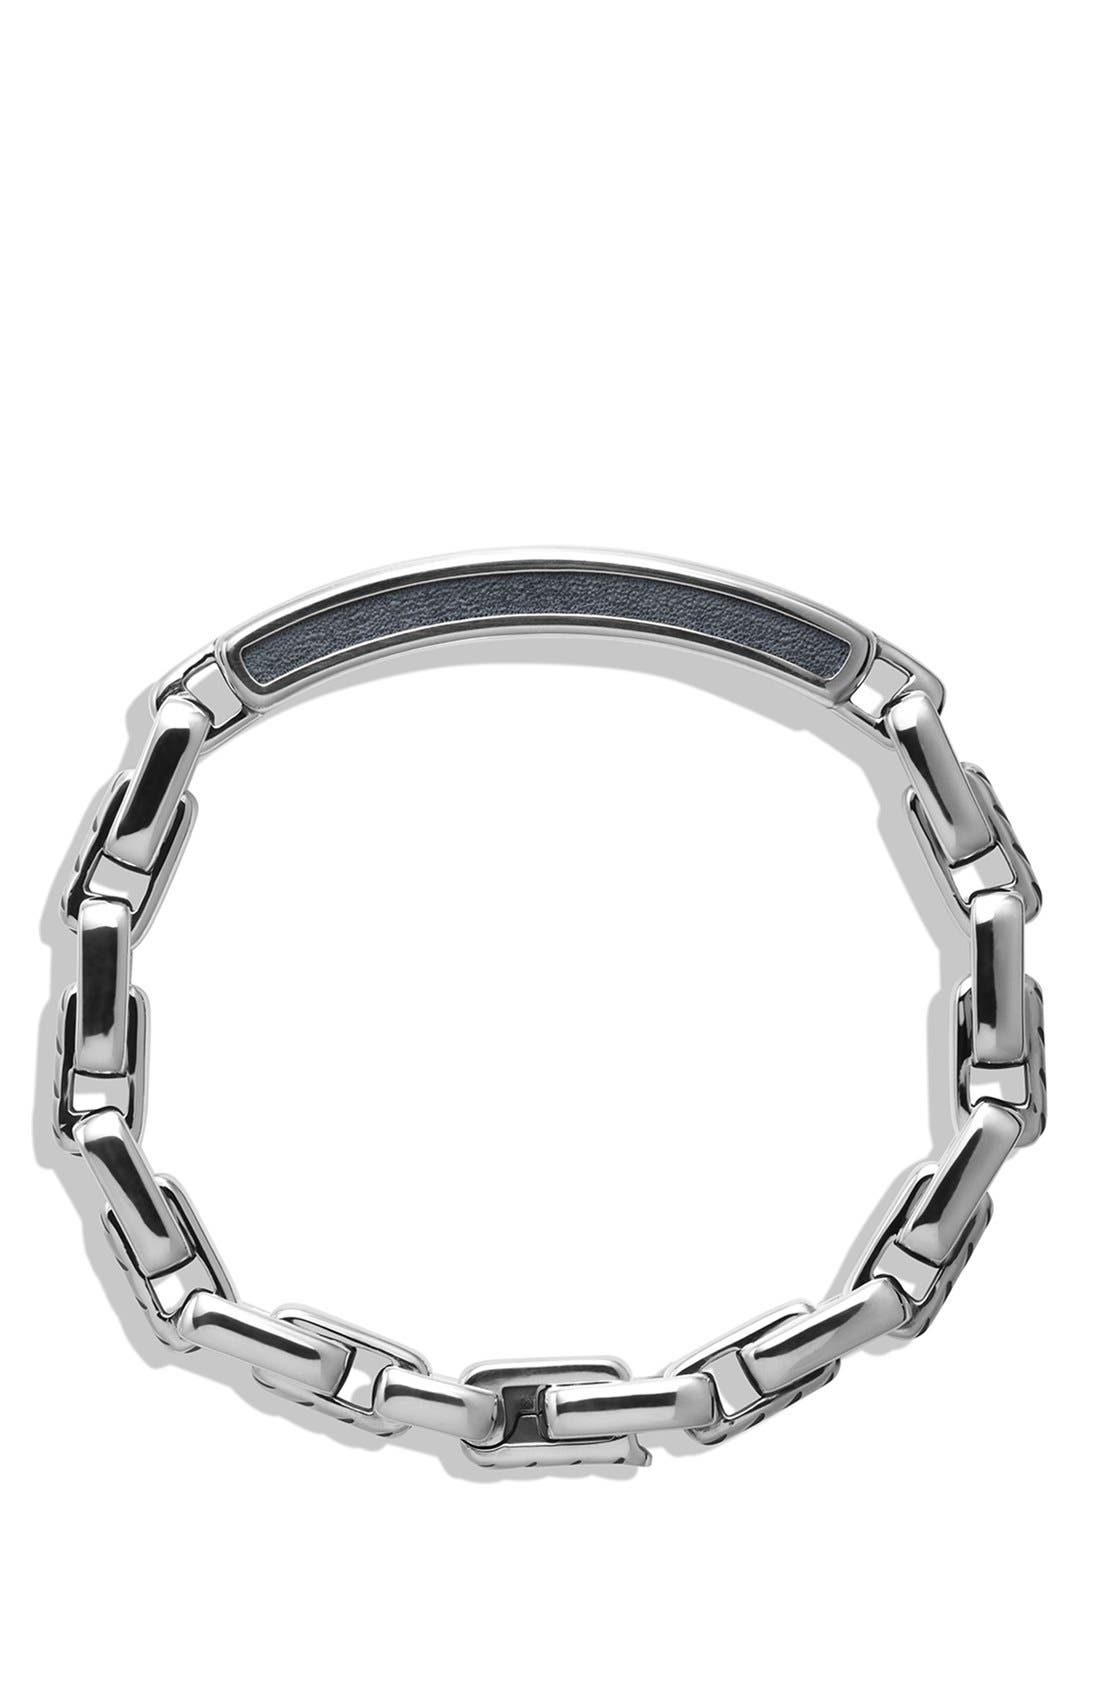 'Modern Cable' ID Bracelet,                             Alternate thumbnail 2, color,                             040